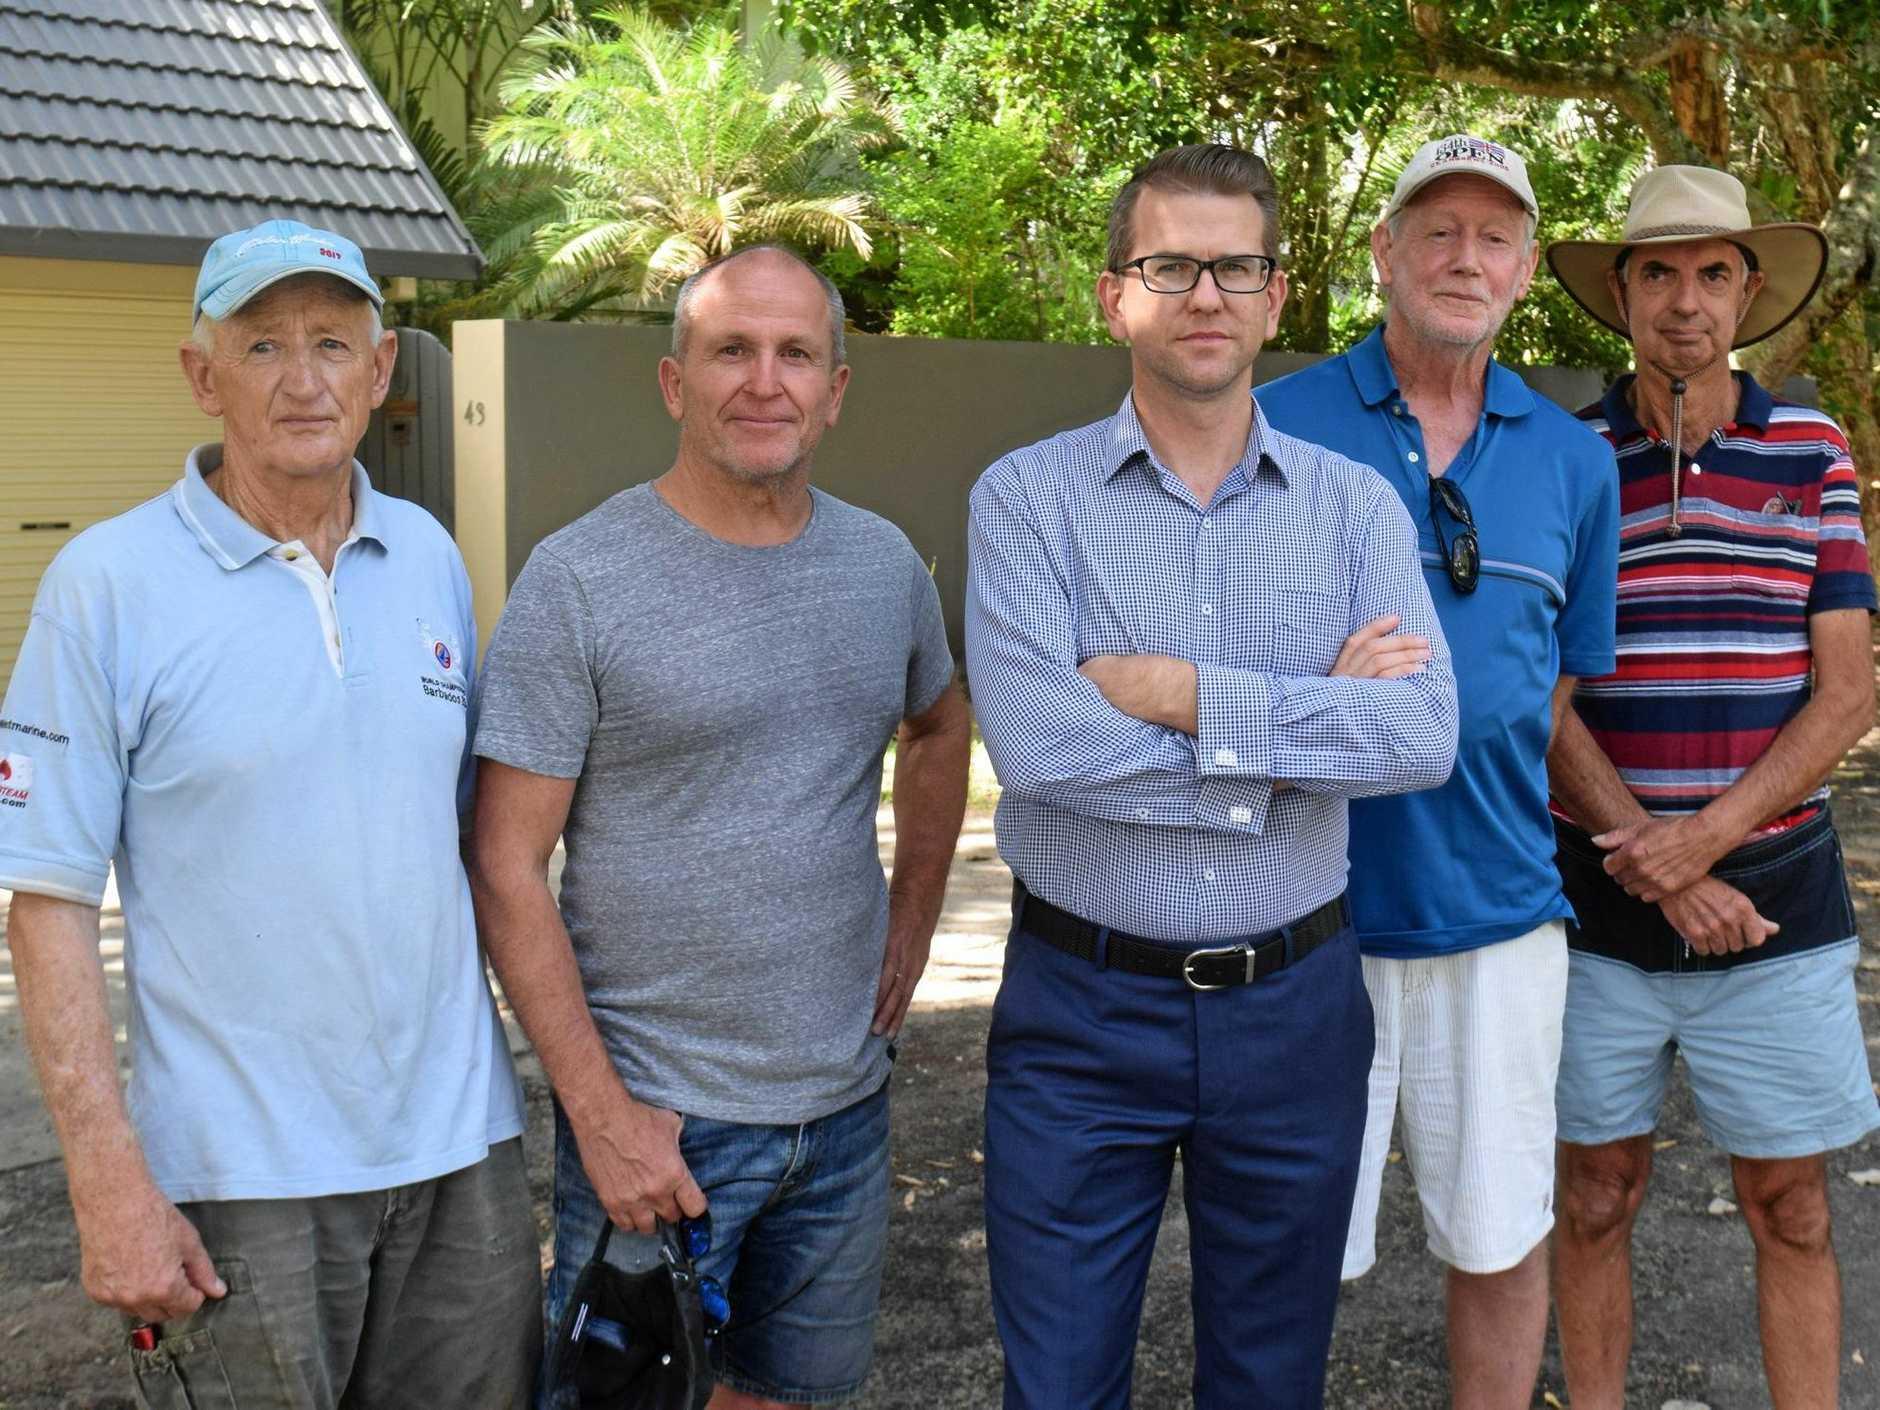 Kawana MP Jarrod Bleijie met with angry Currimundi locals Earle Alexander, Greg Hindmarsh, Peter Ruffle and Richard Freeman.